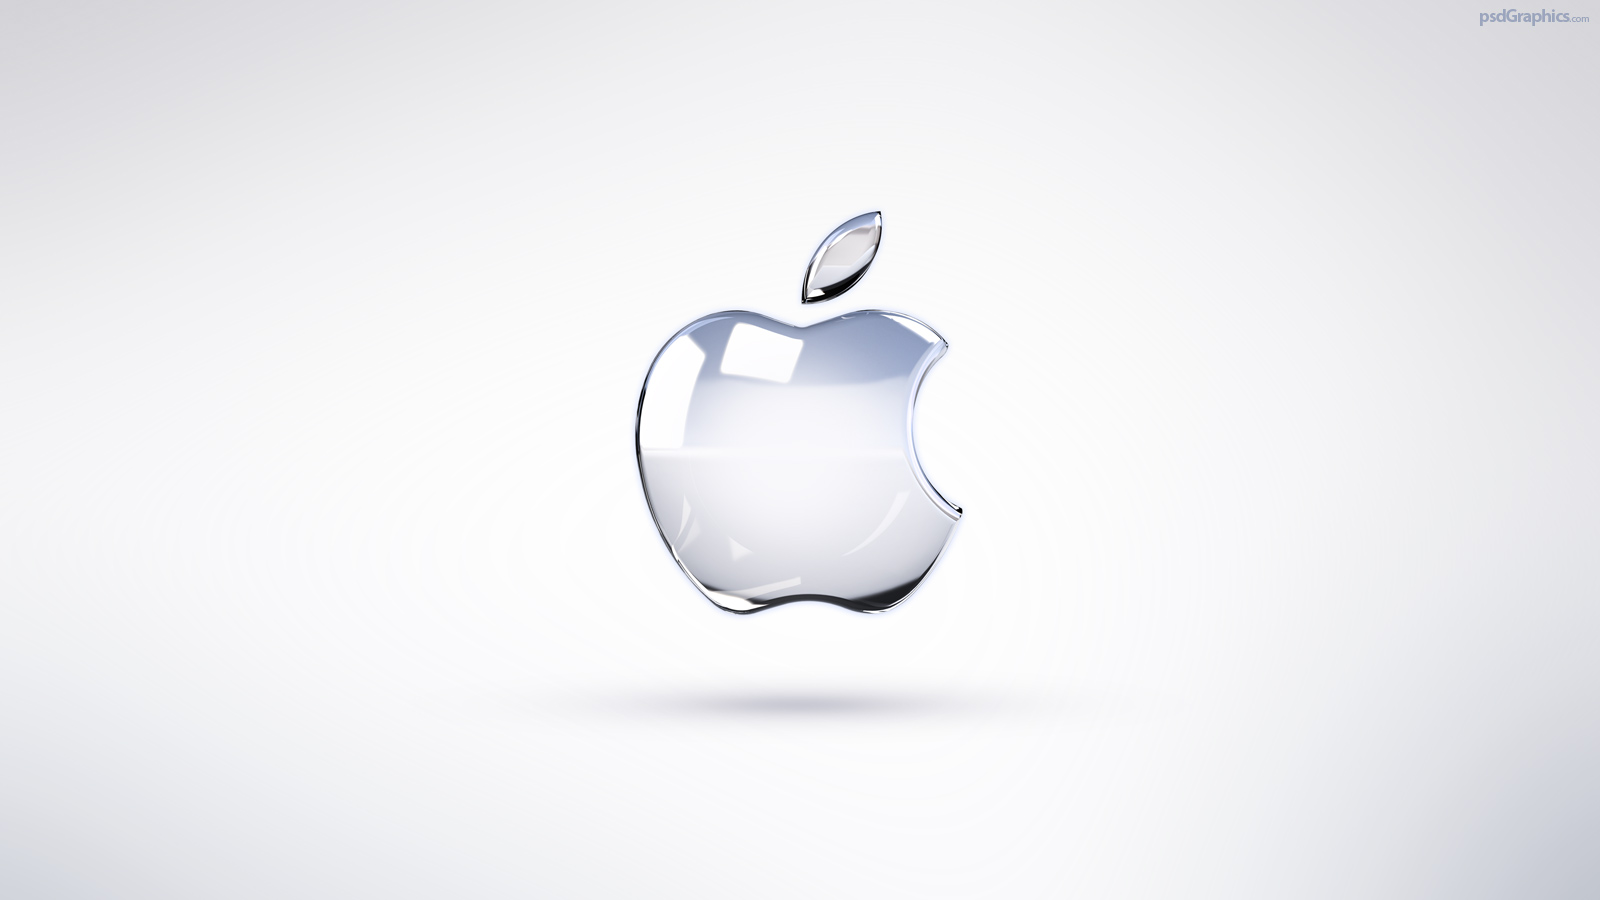 bright apple logo wallpaper psdgraphics